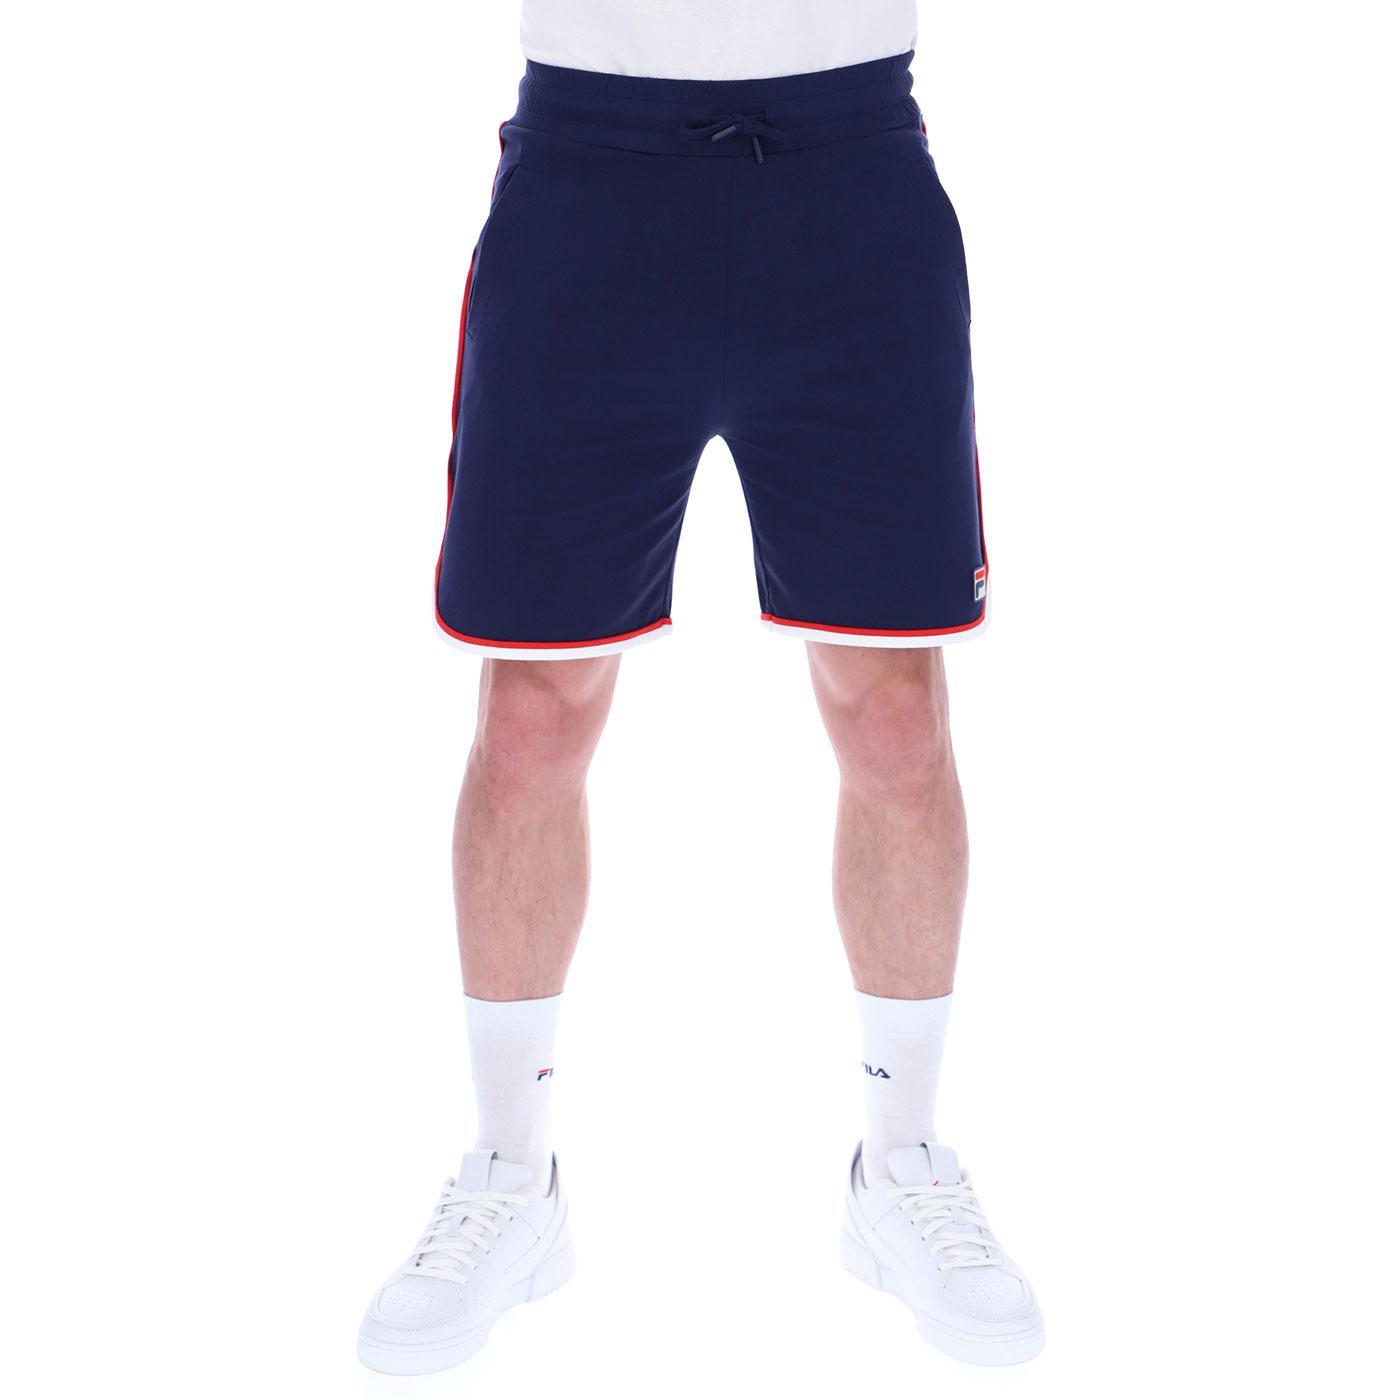 Brace FILA VINTAGE Stripe Trim Shorts (Peacoat)